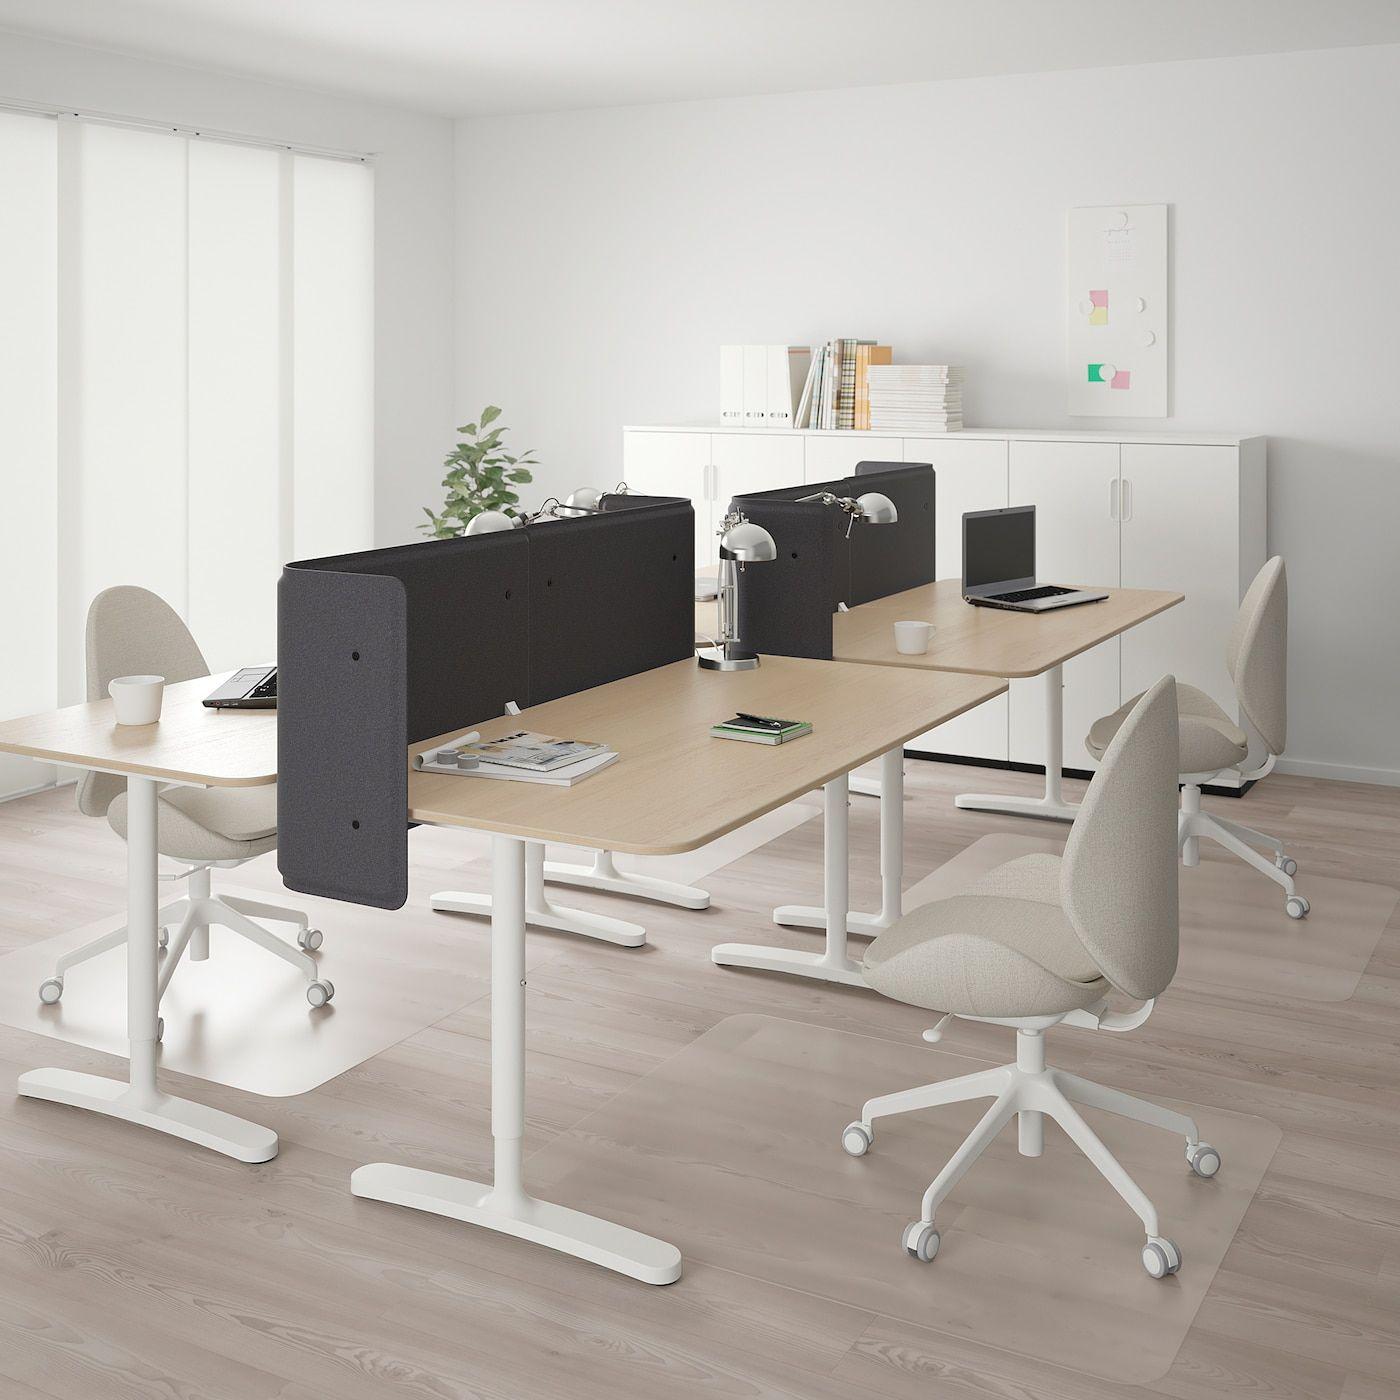 Bekant Desk With Screen White Stained Oak Veneer White Ikea In 2020 Black Office Furniture Office Furniture Design Ikea Bekant Desk